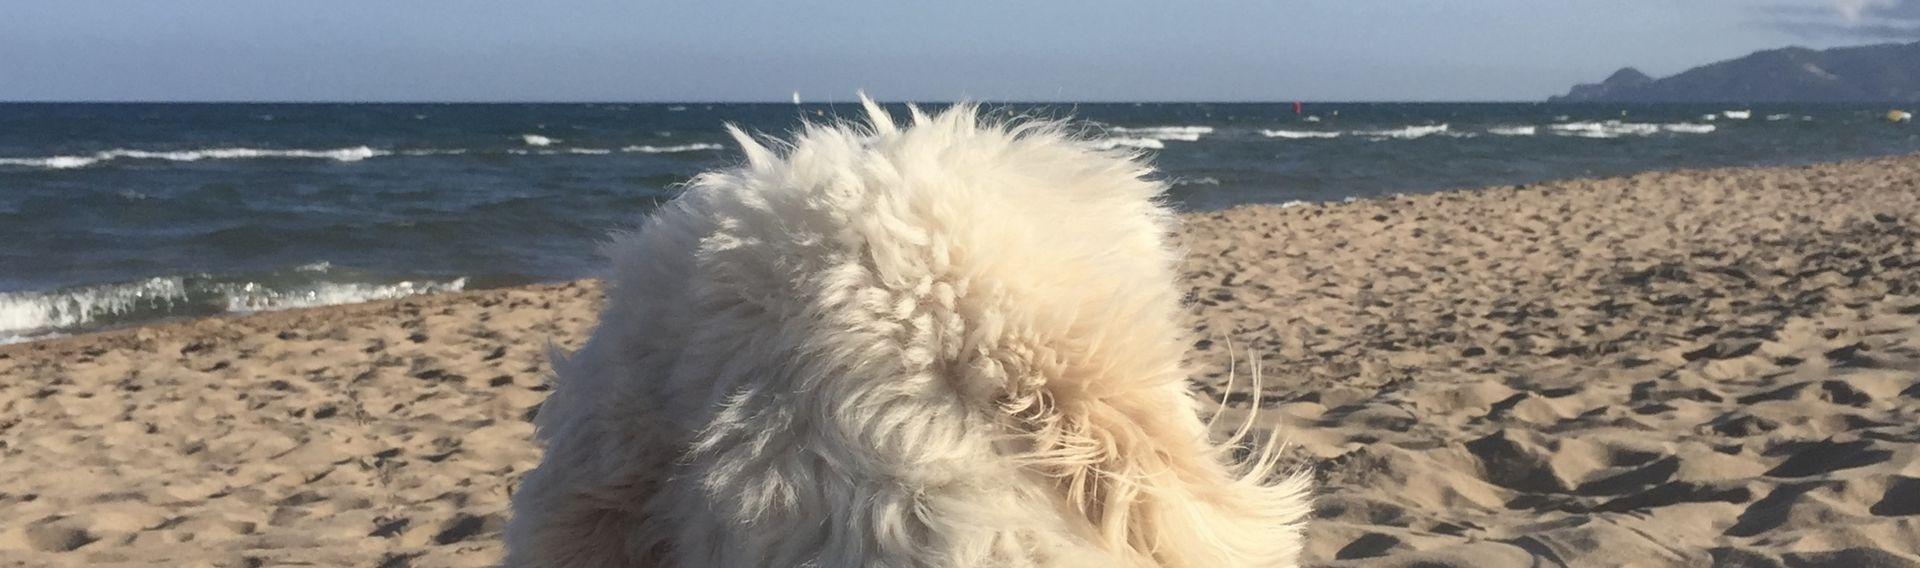 Strandhotels mit Hund